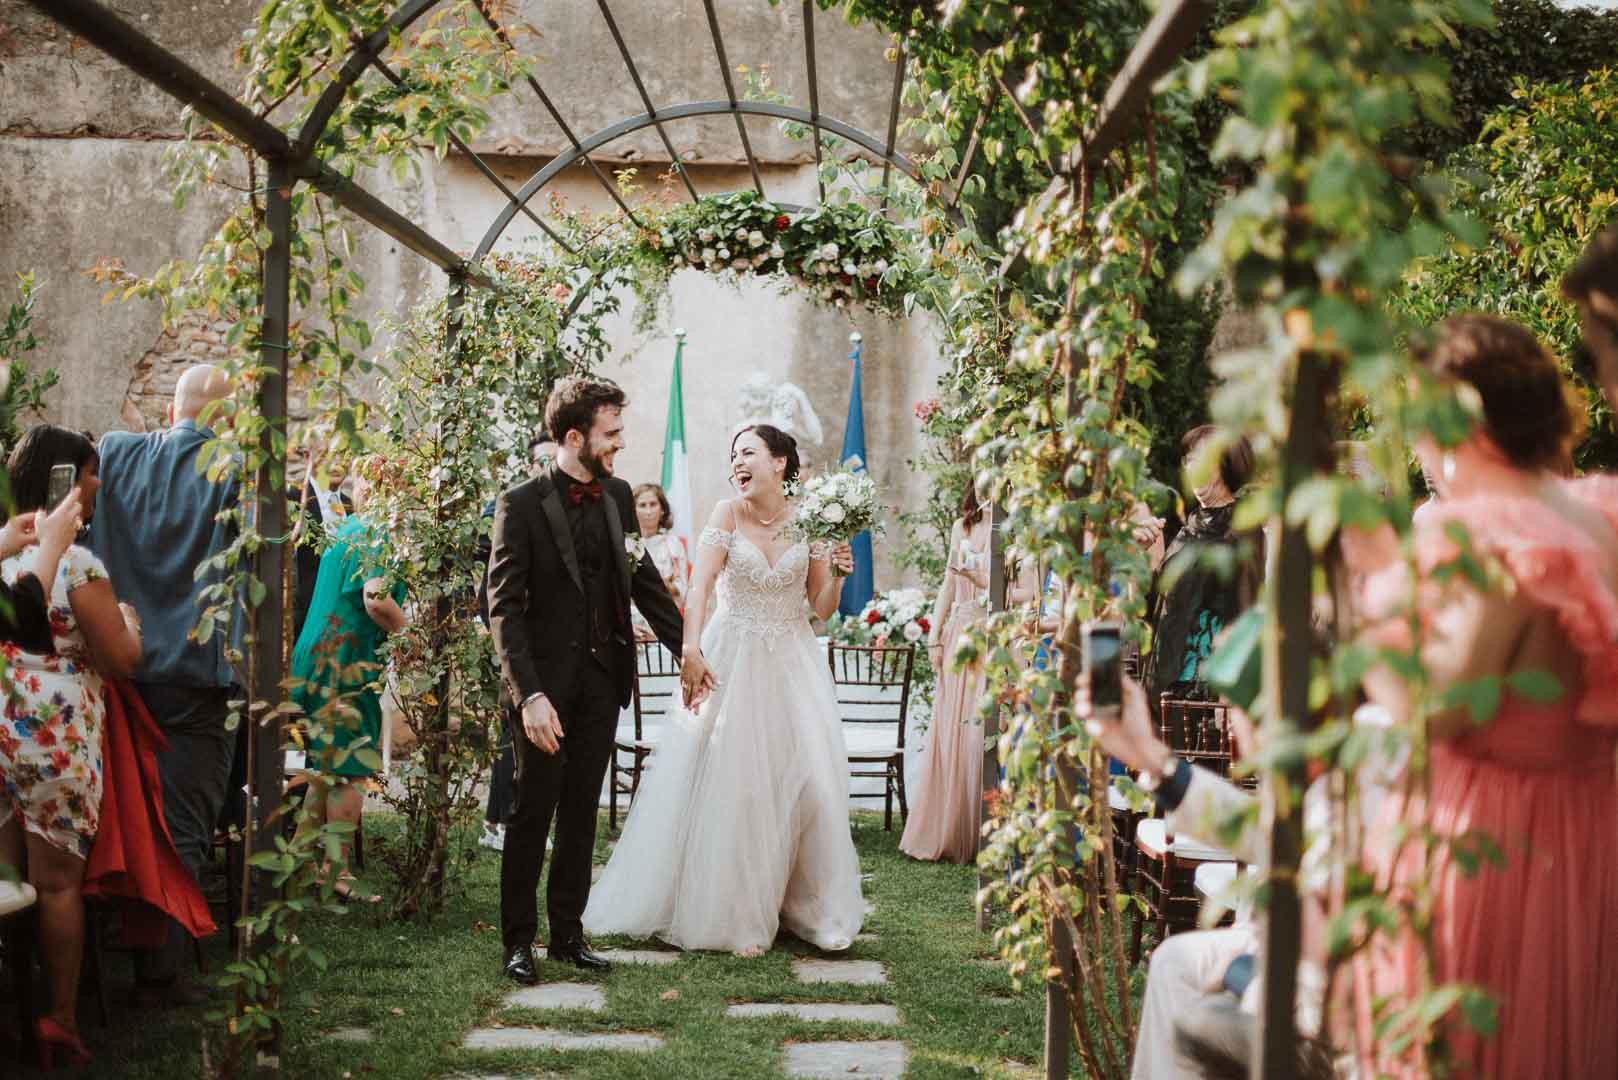 wedding-photographer-destination-fineart-bespoke-reportage-tuscany-villascorzi-vivianeizzo-spazio46-81